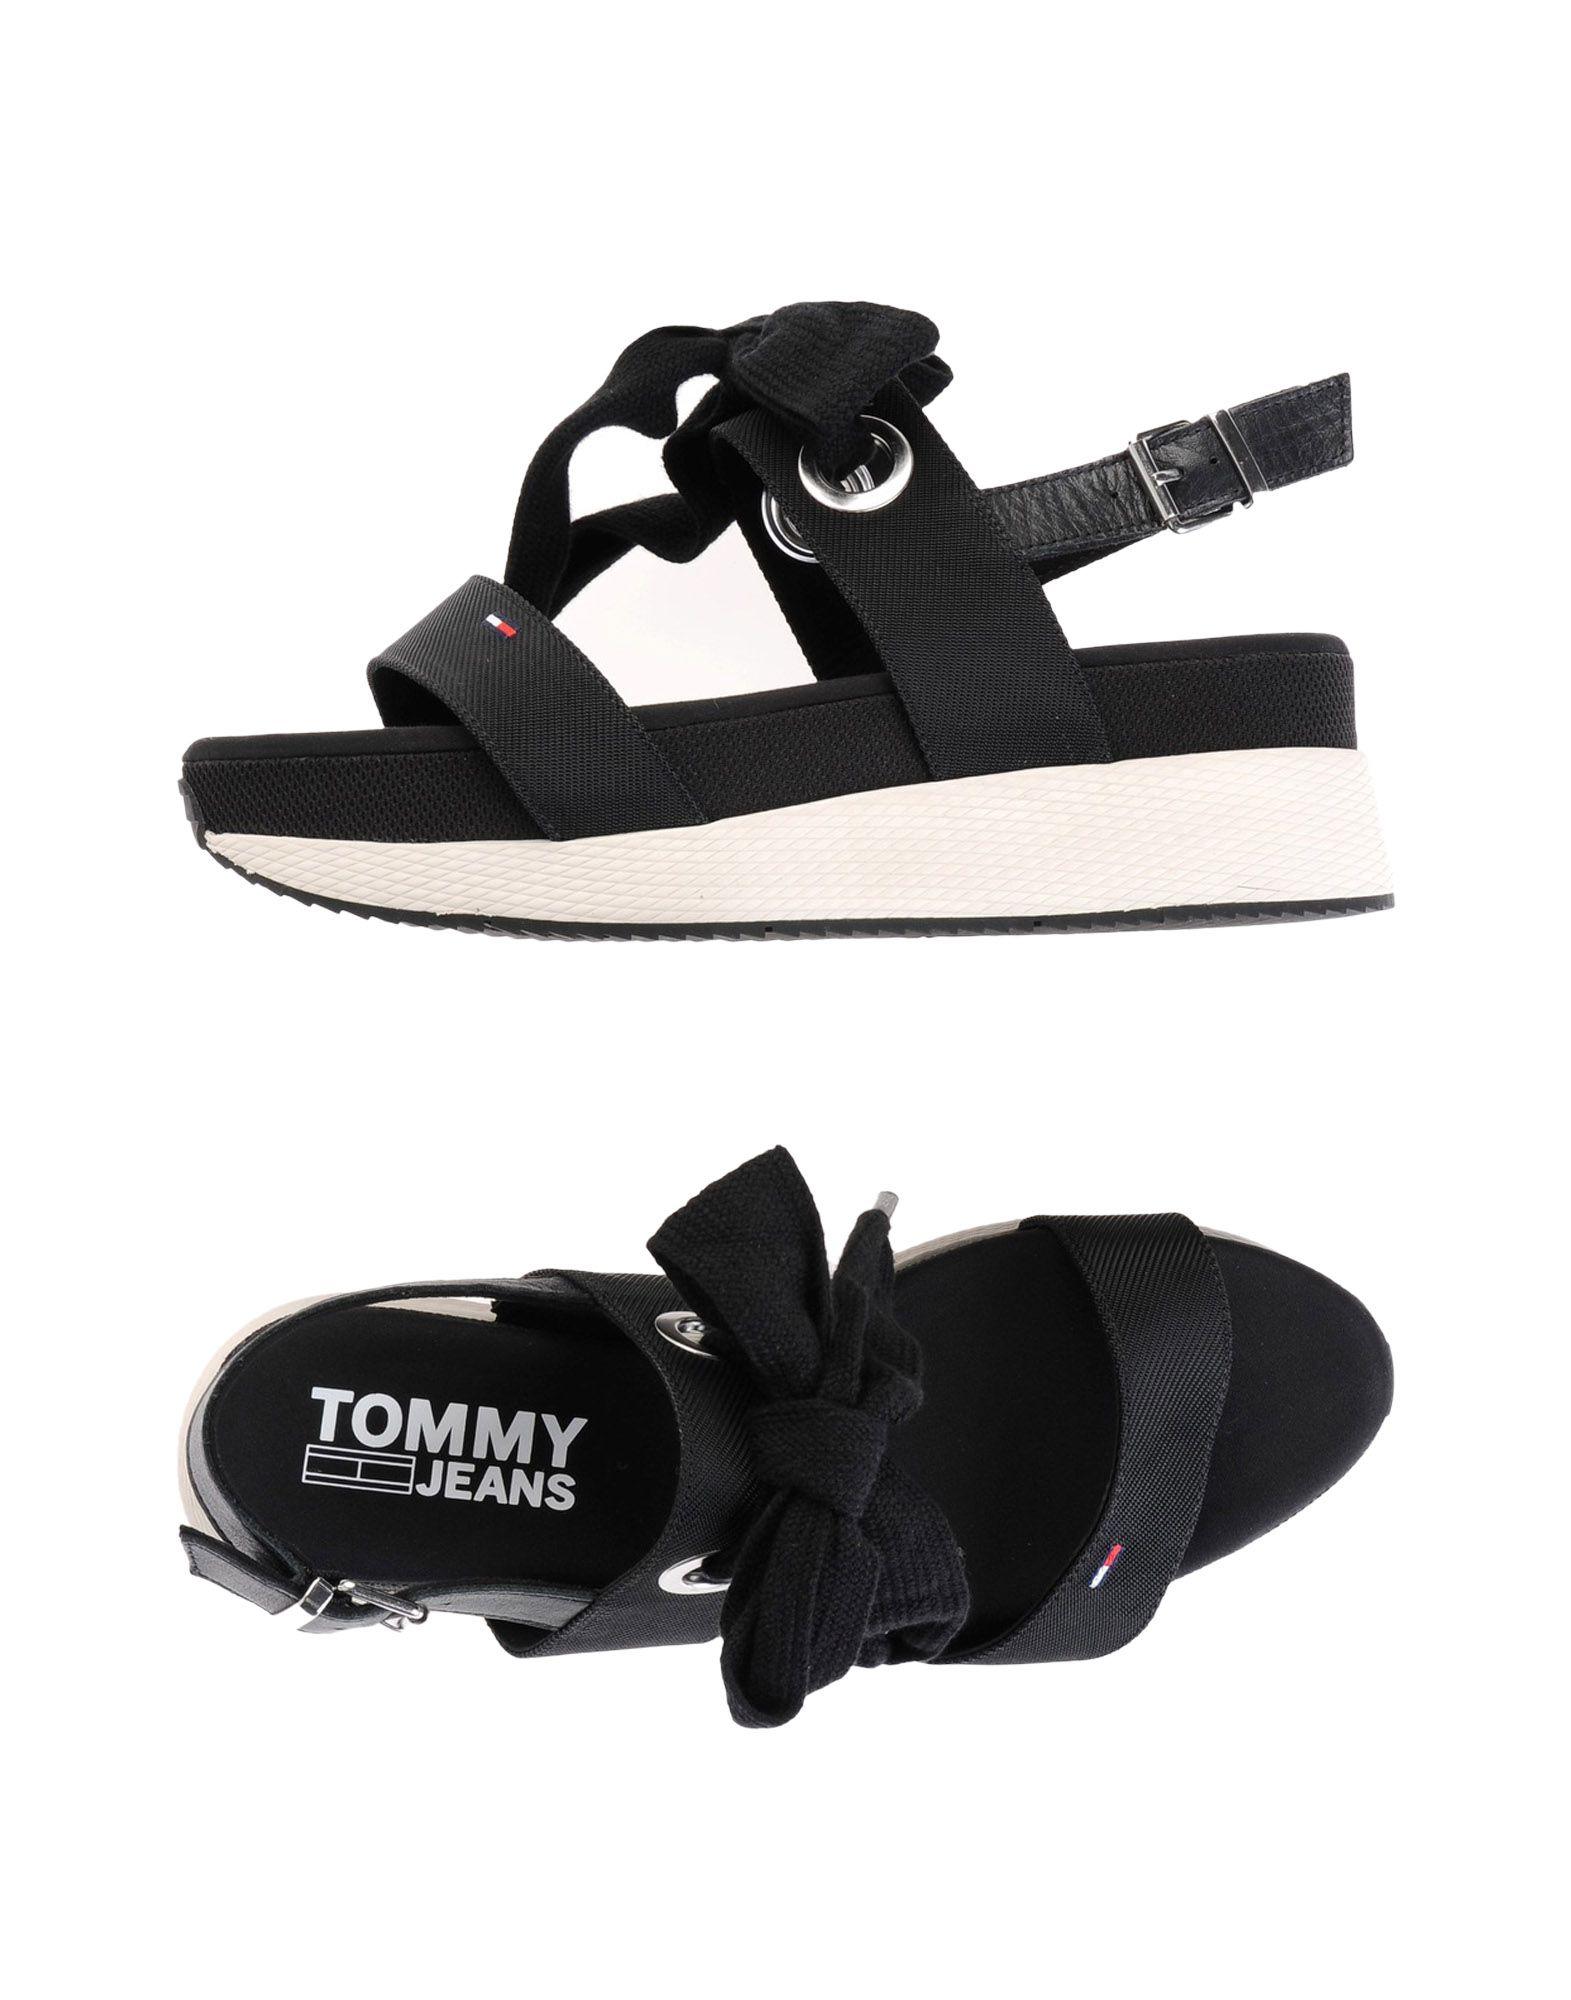 Tommy Jeans Modern Hybrid Sandal Bow  11476548OK Gute Qualität beliebte Schuhe